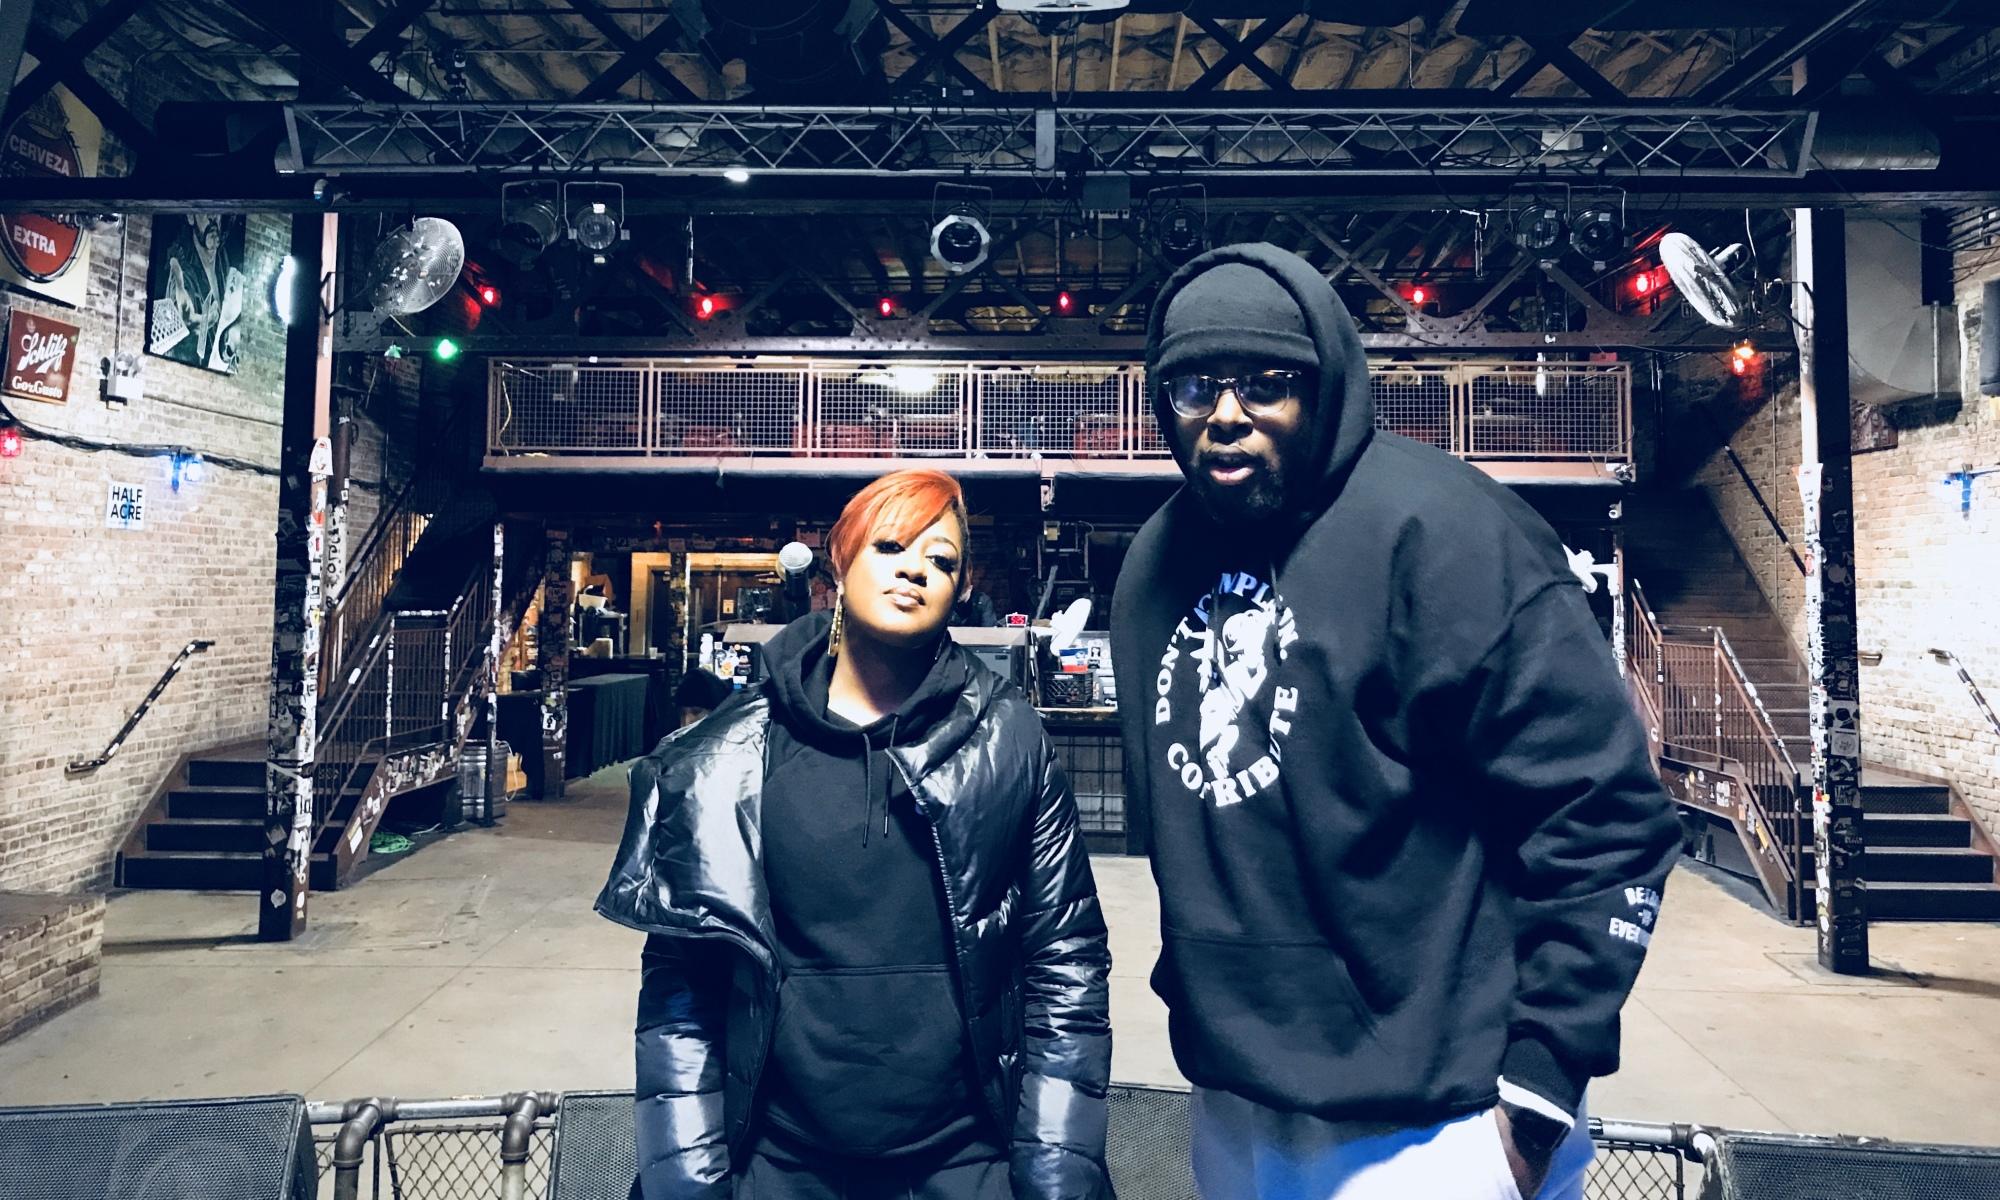 Chris Patterson and Janelle Monae